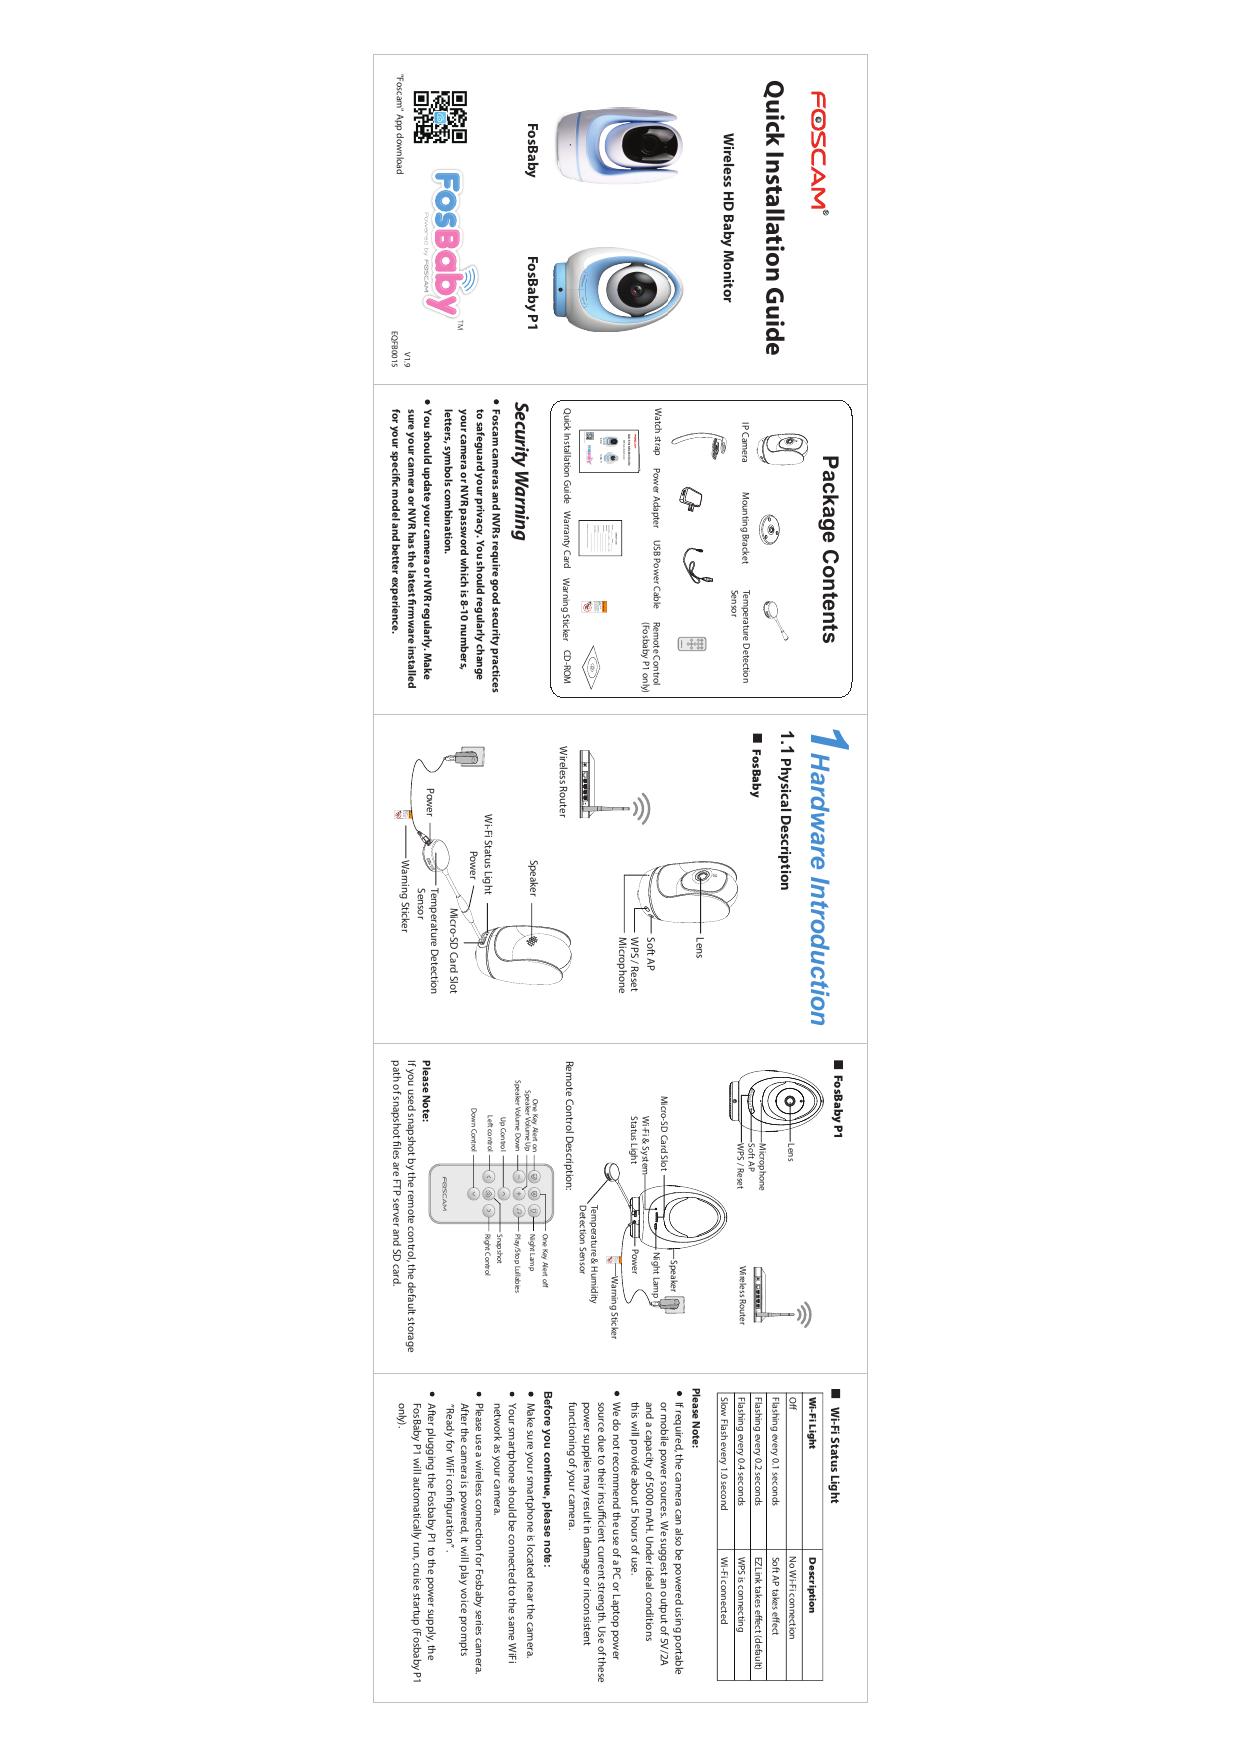 Q uick Installa tion G uide Hardware Introduction   manualzz com